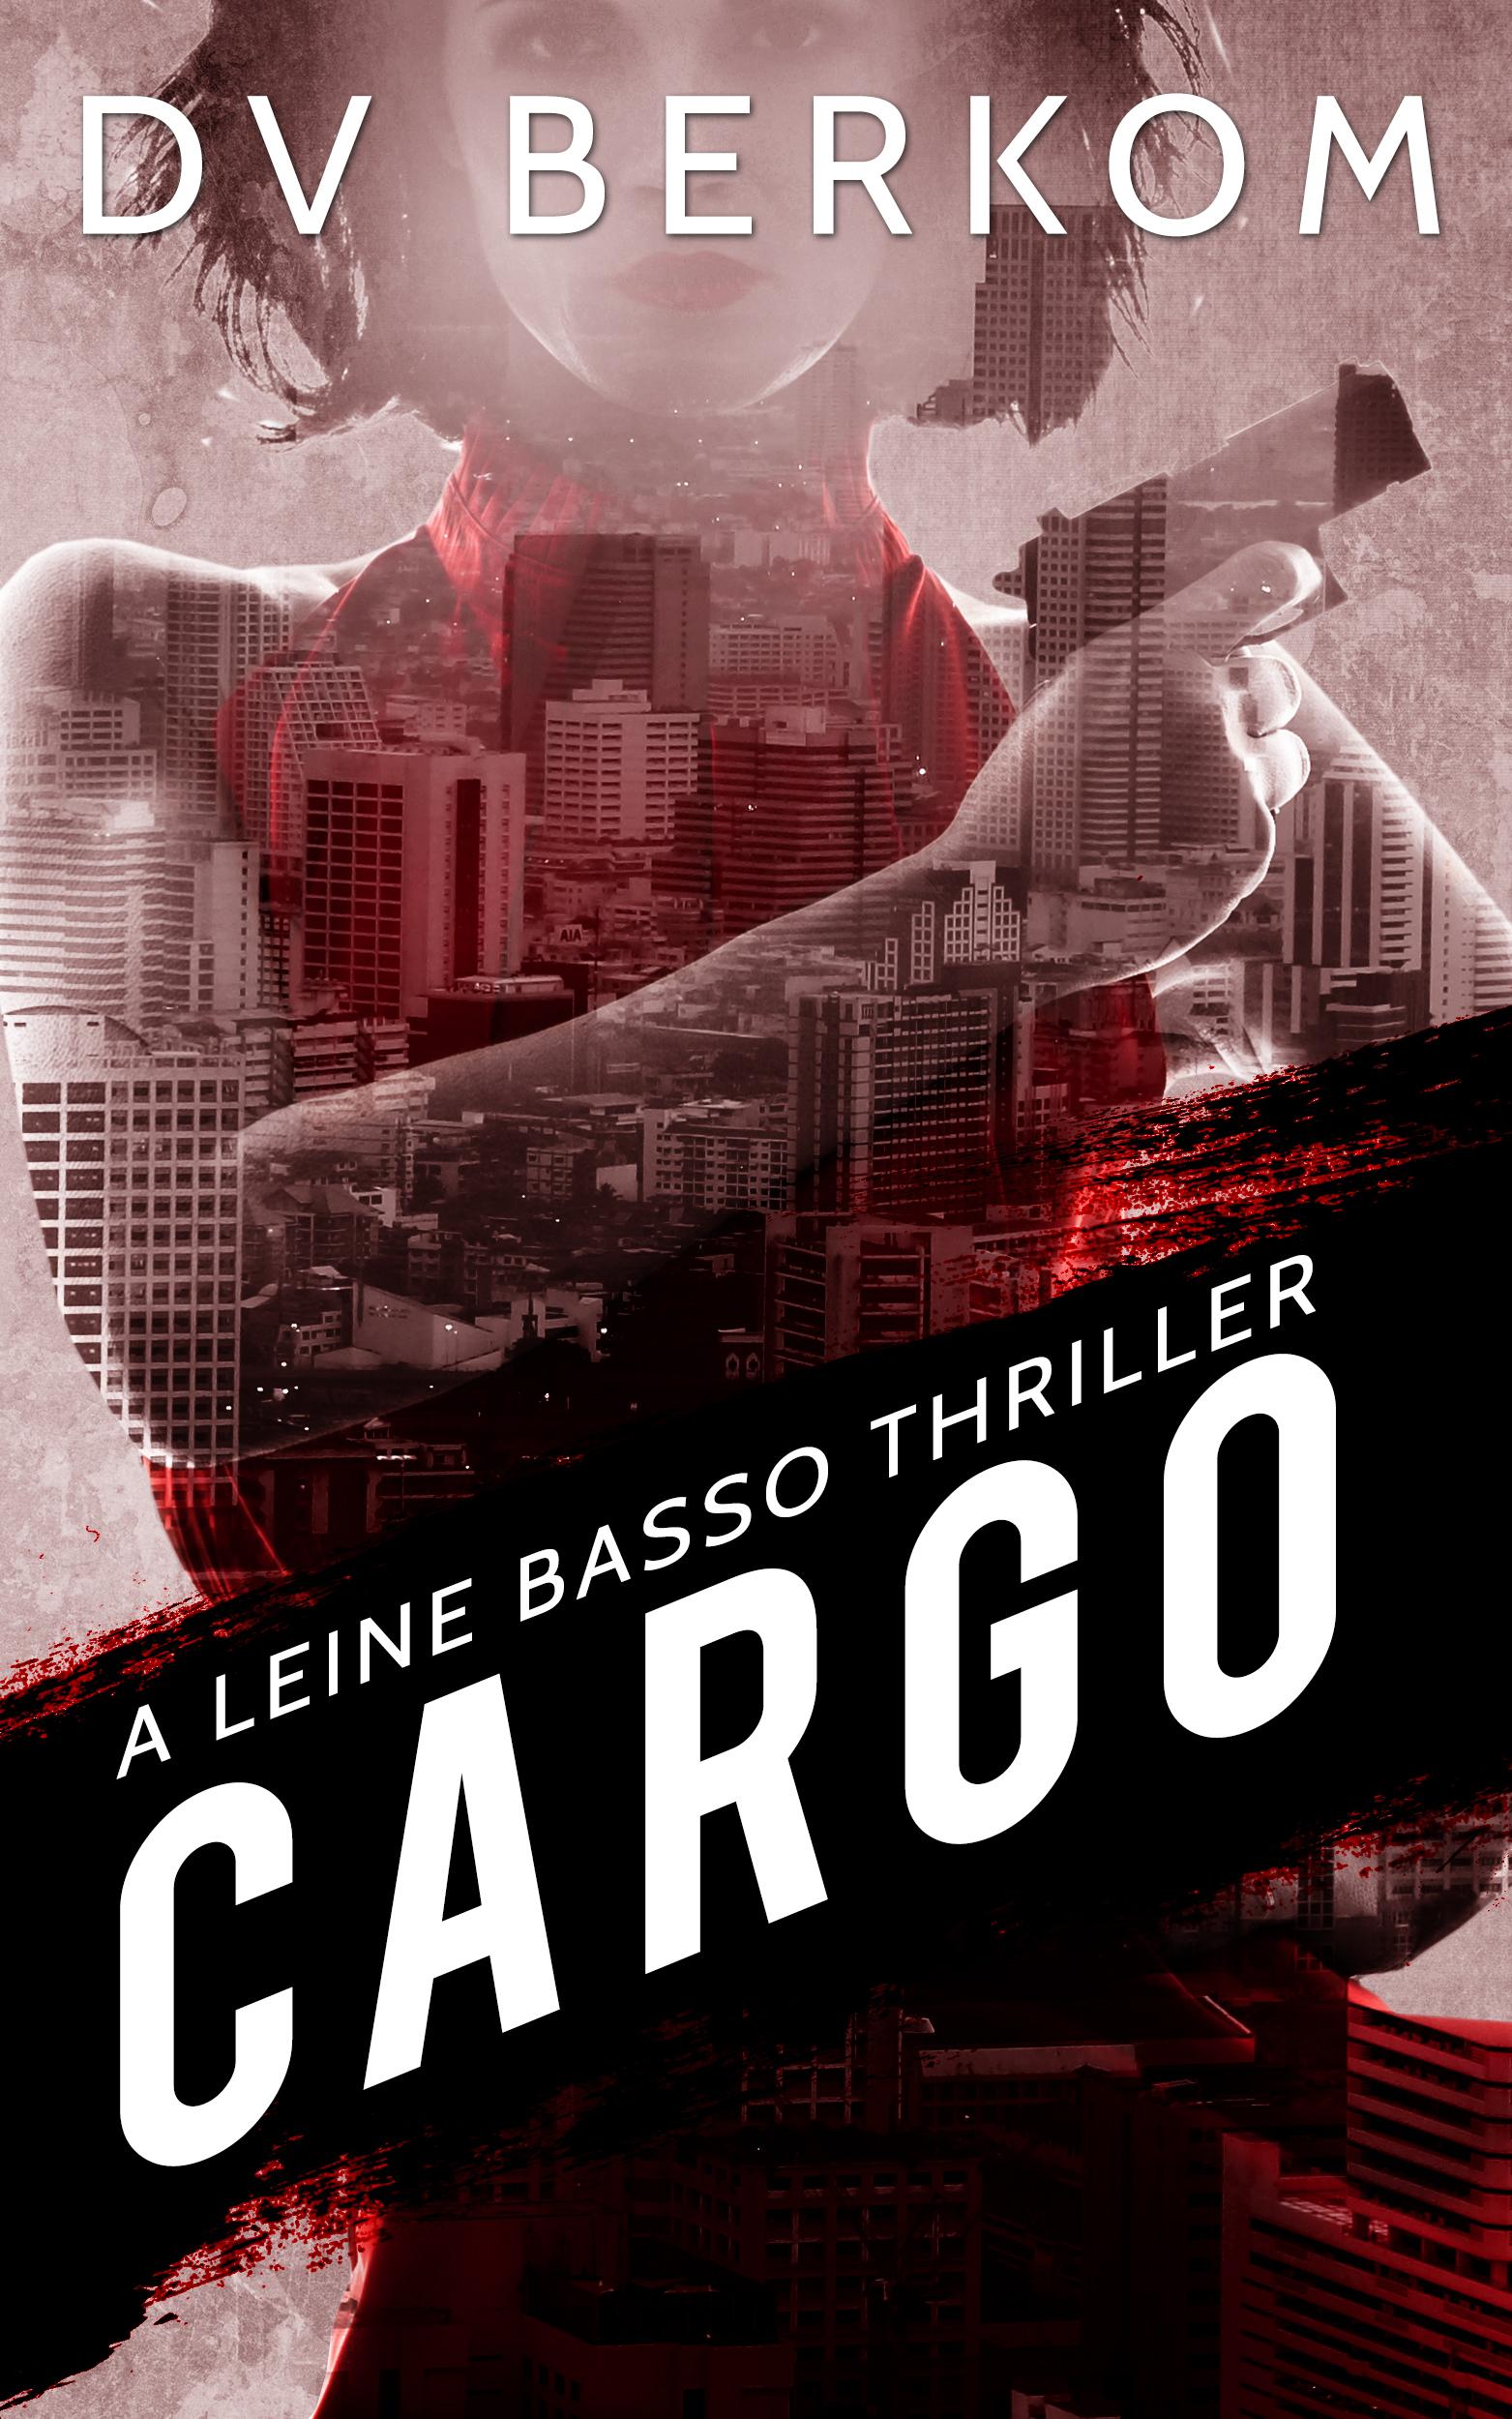 Cargo (A Leine Basso Thriller #4) D.V. Berkom